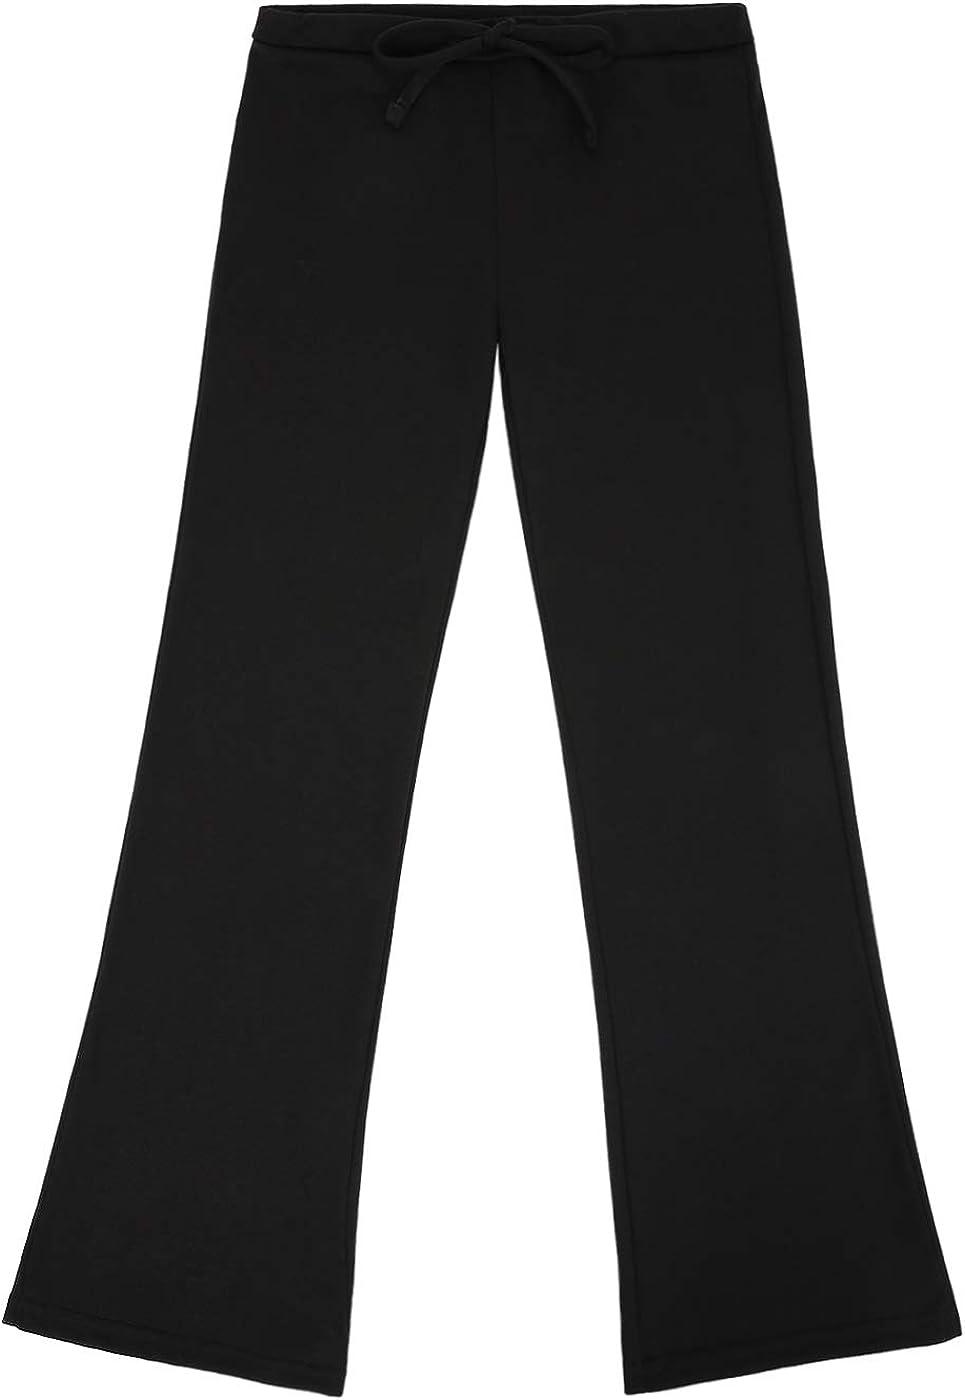 HDE Girls Pajama Pants Soft Sleepwear Casual Loose Lounge Bottoms